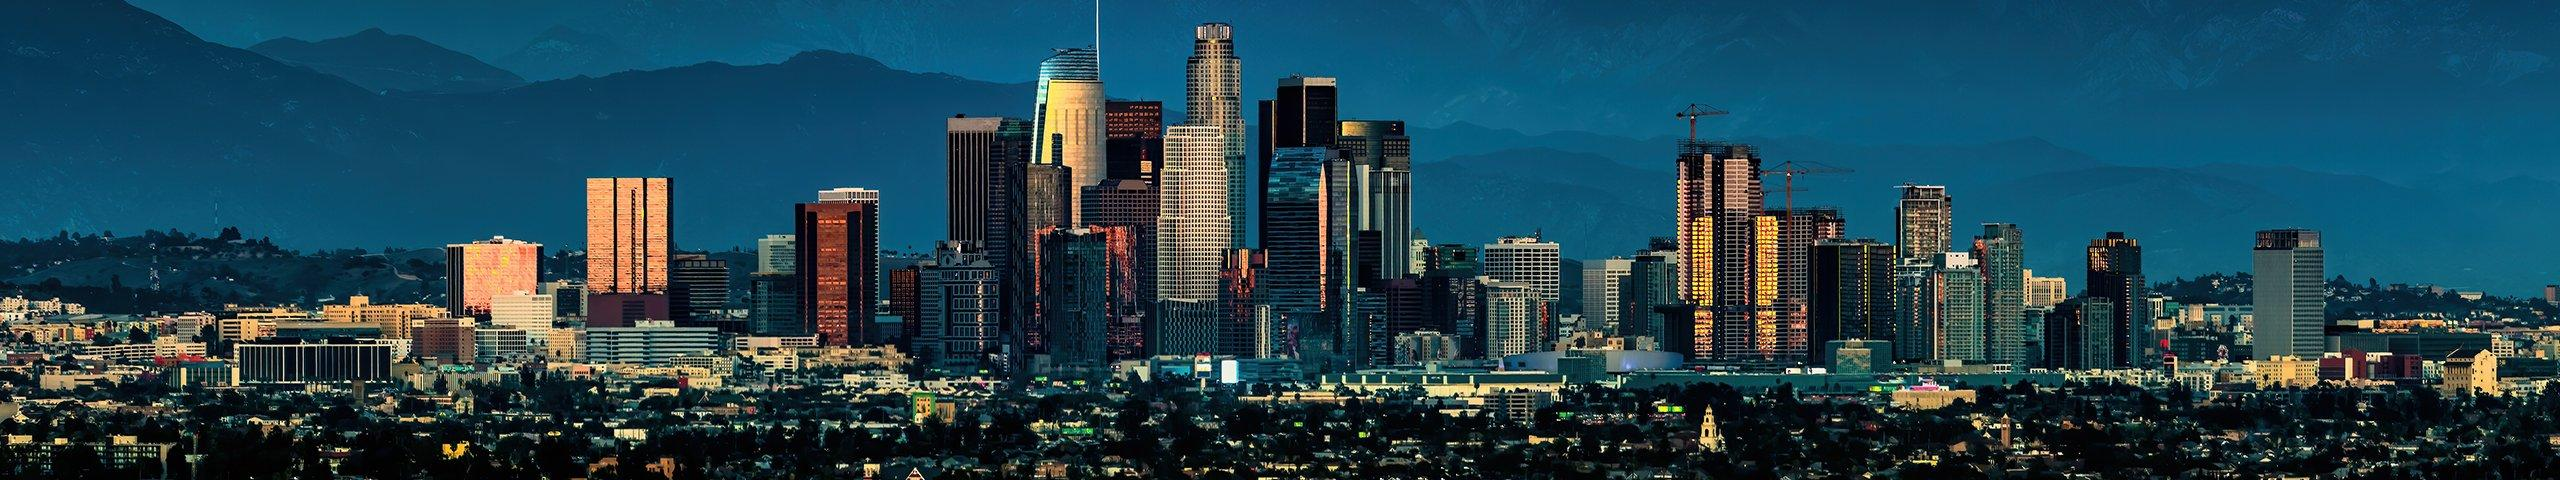 skyline of los angeles california